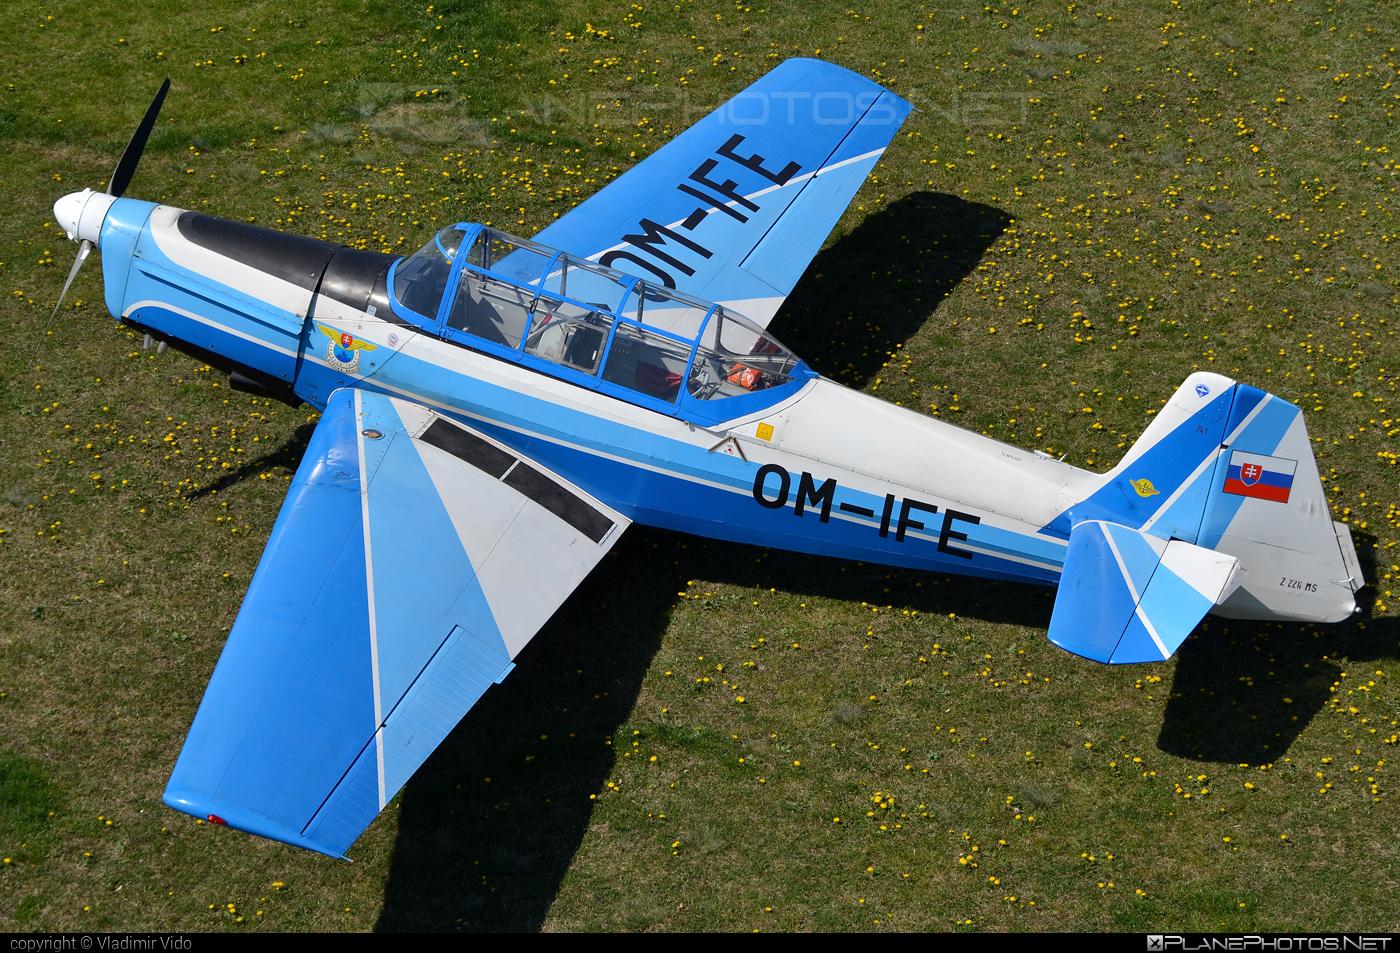 Aeroklub Trenčín Zlin Z-226MS Trenér - OM-IFE #z226 #z226trener #zlin #zlin226 #zlintrener